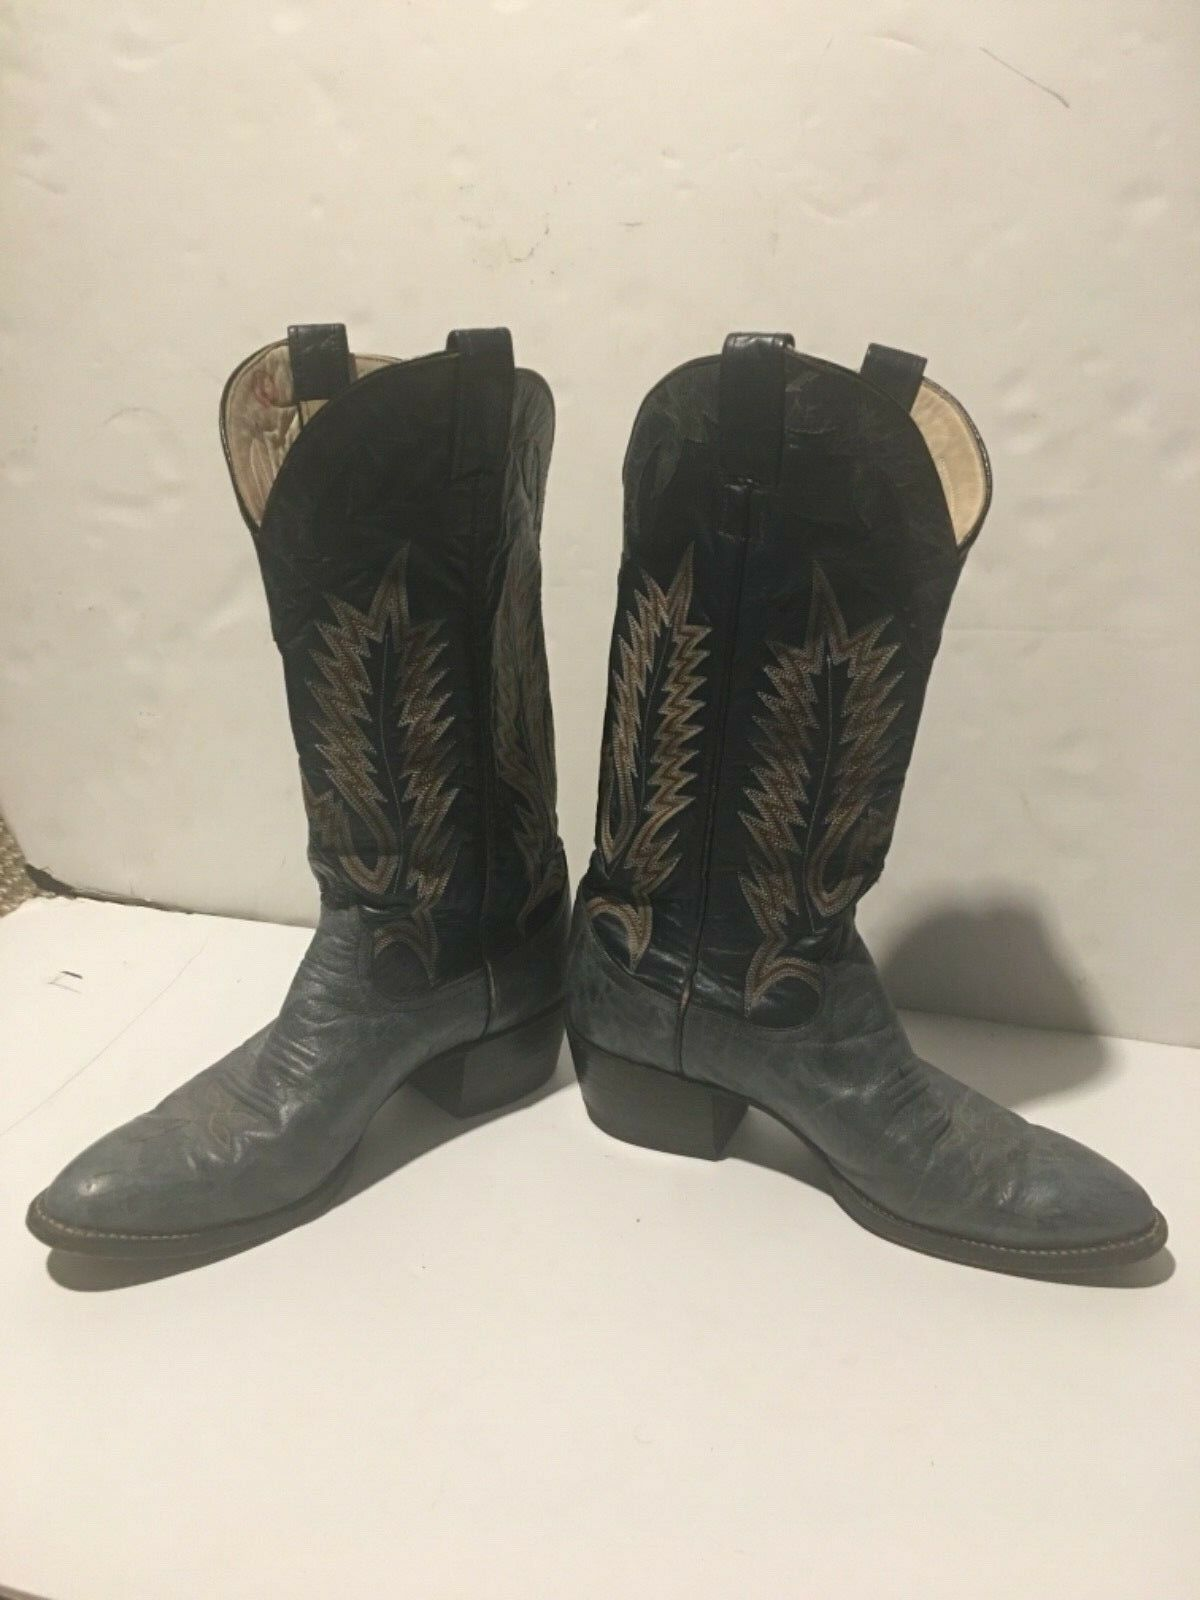 Larry Mahan Cowboy Cowboy Cowboy western Boots size 9 fdd1aa